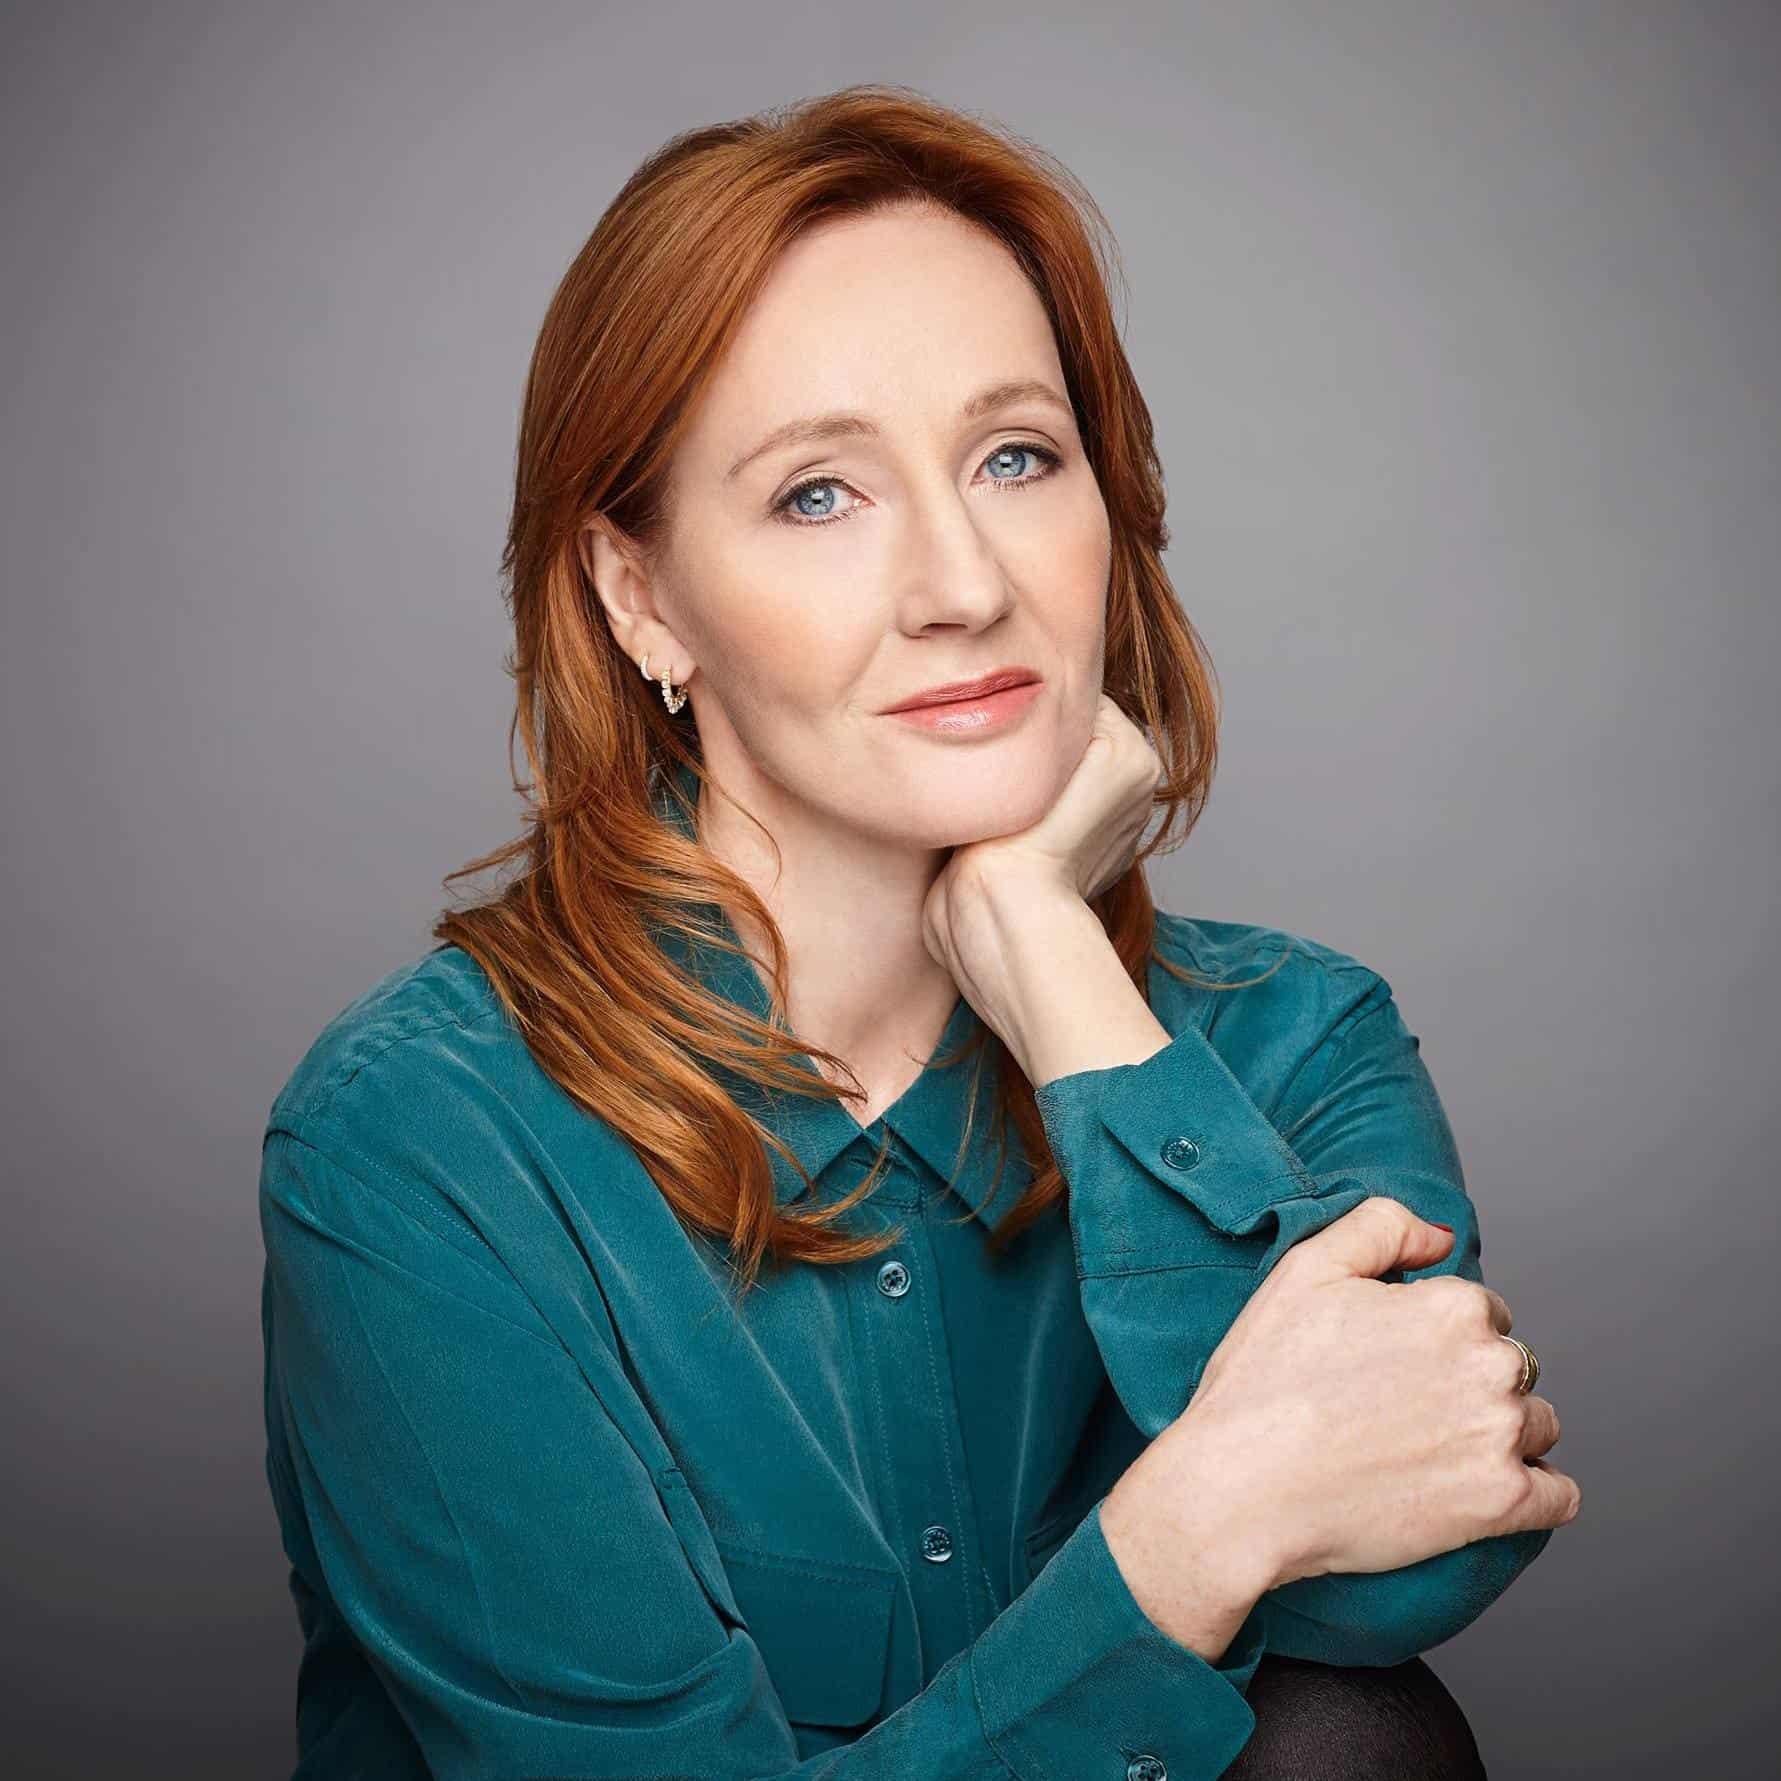 J.K. Rowling emprendedora literaria con una historia de magia